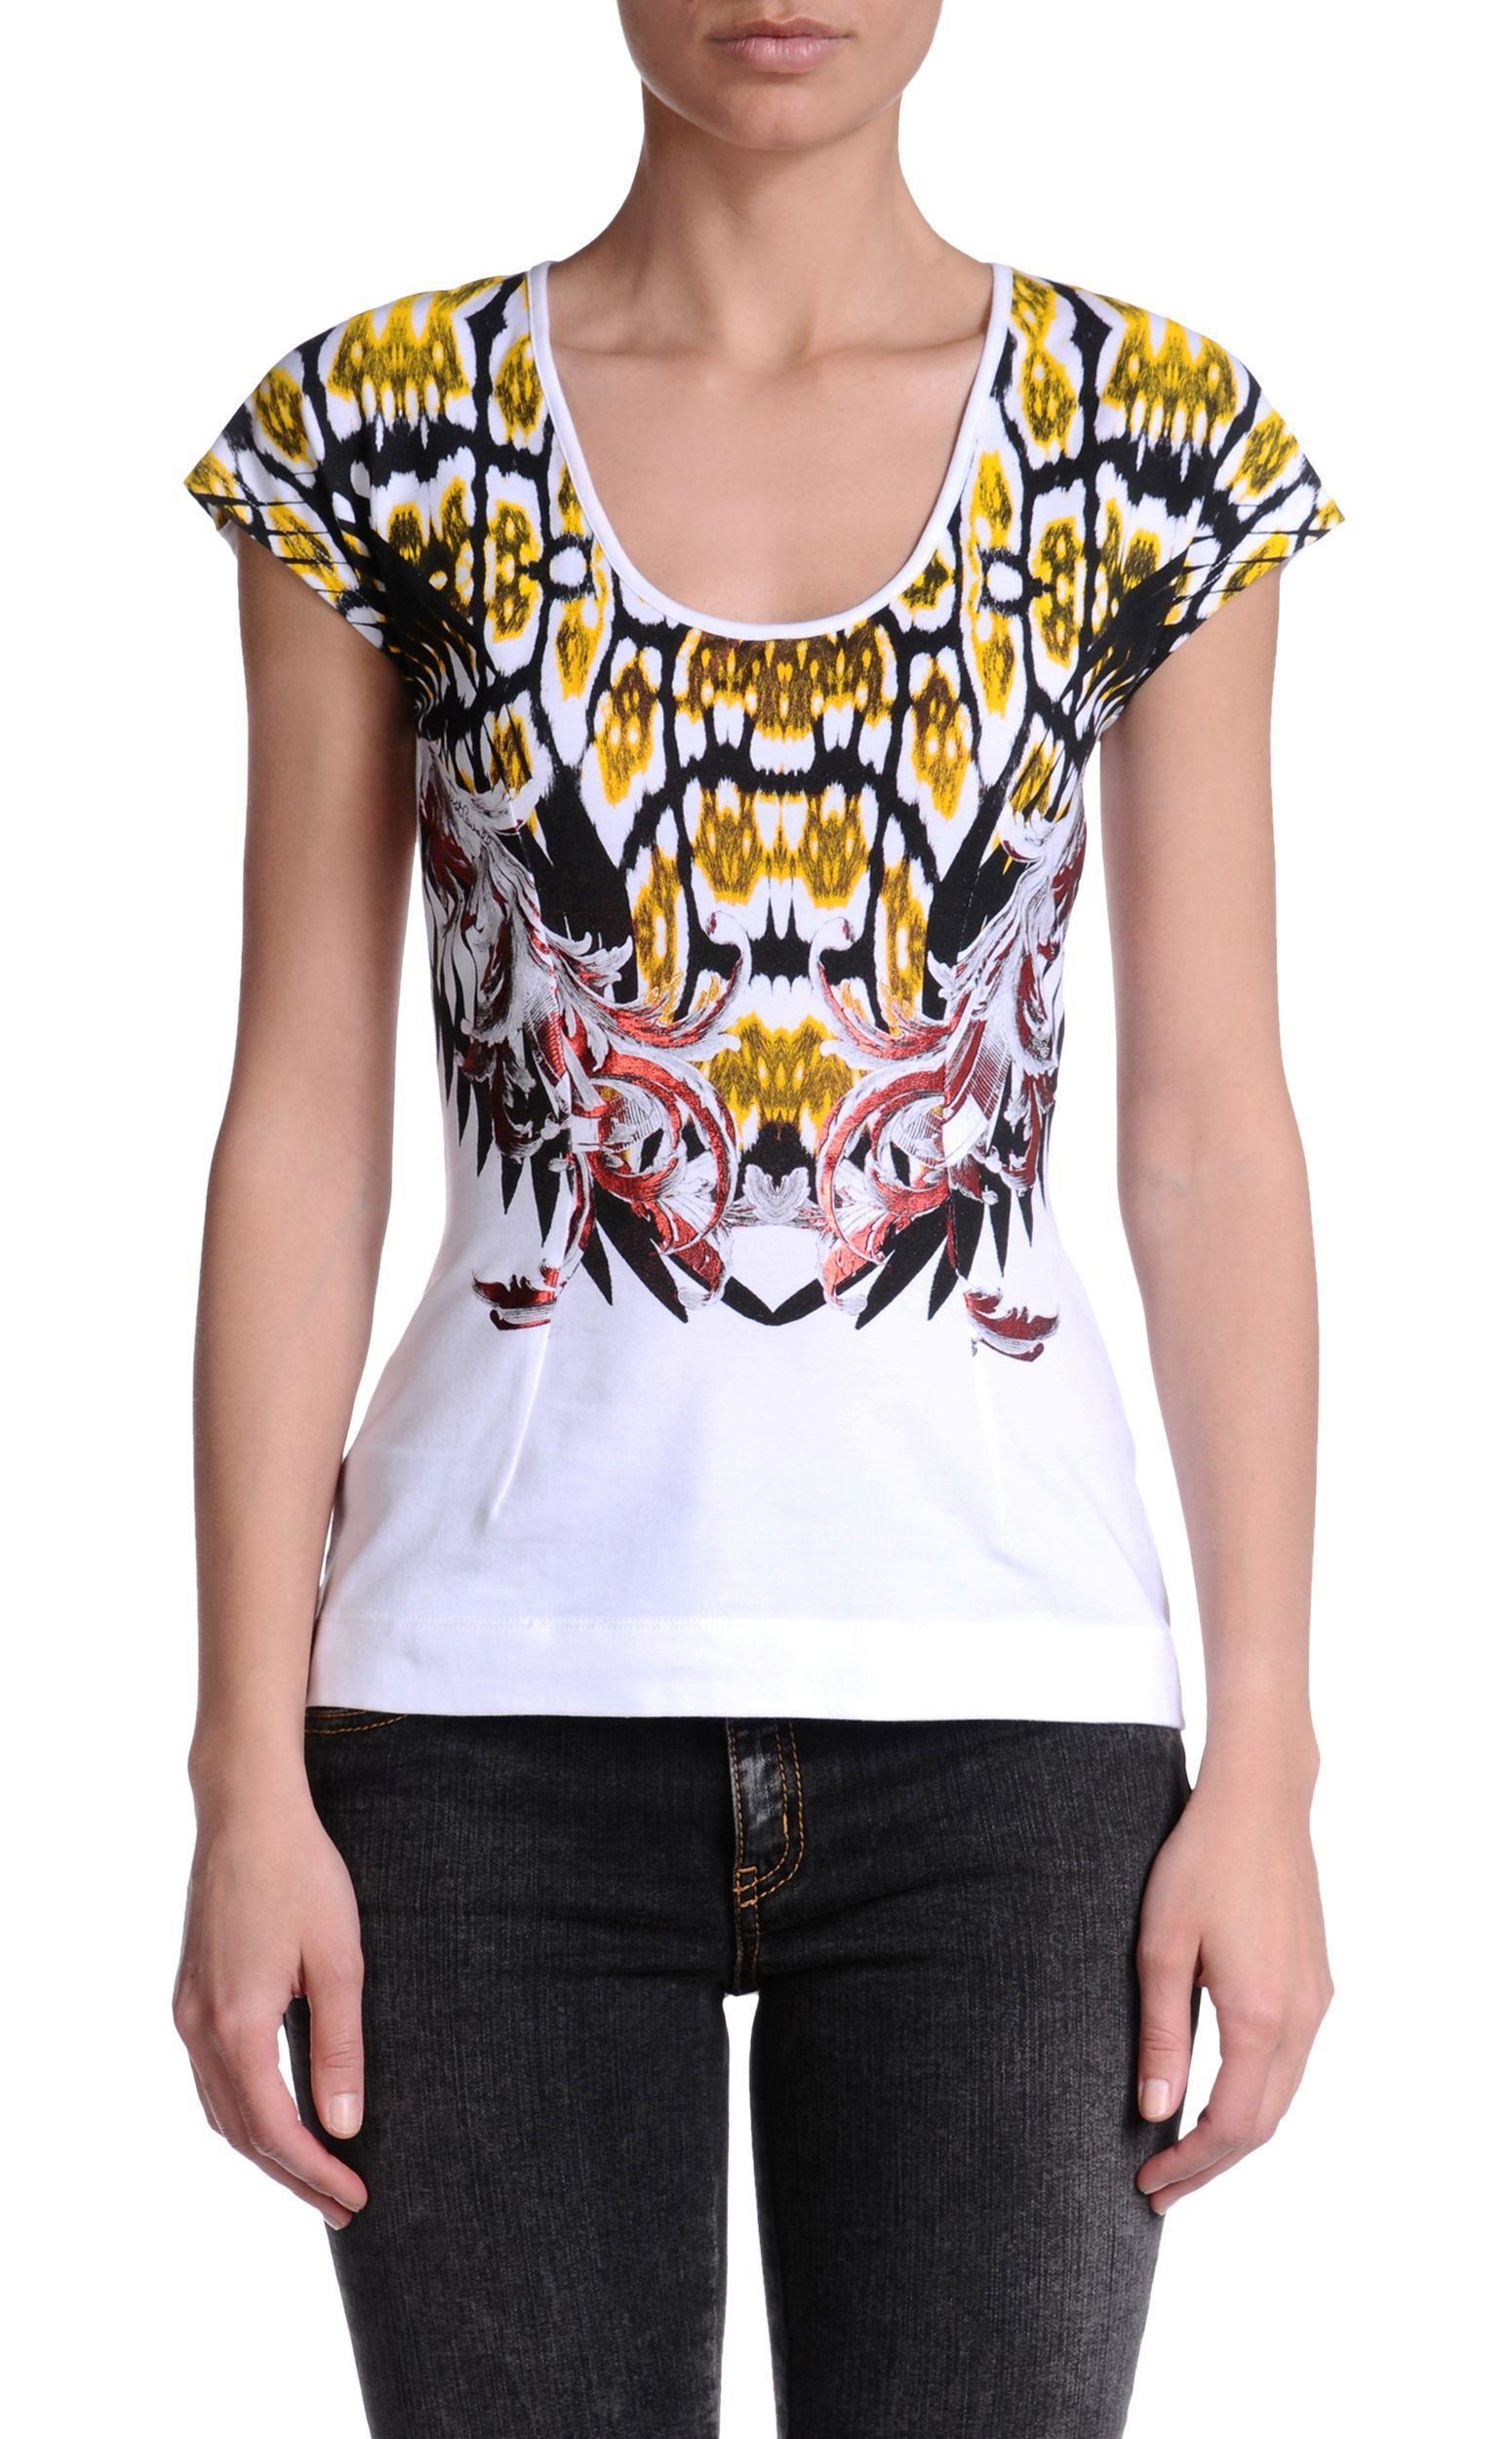 huge discount 51767 dfbd3 Short sleeve t-shirt Women - Topwear Women on Just Cavalli ...